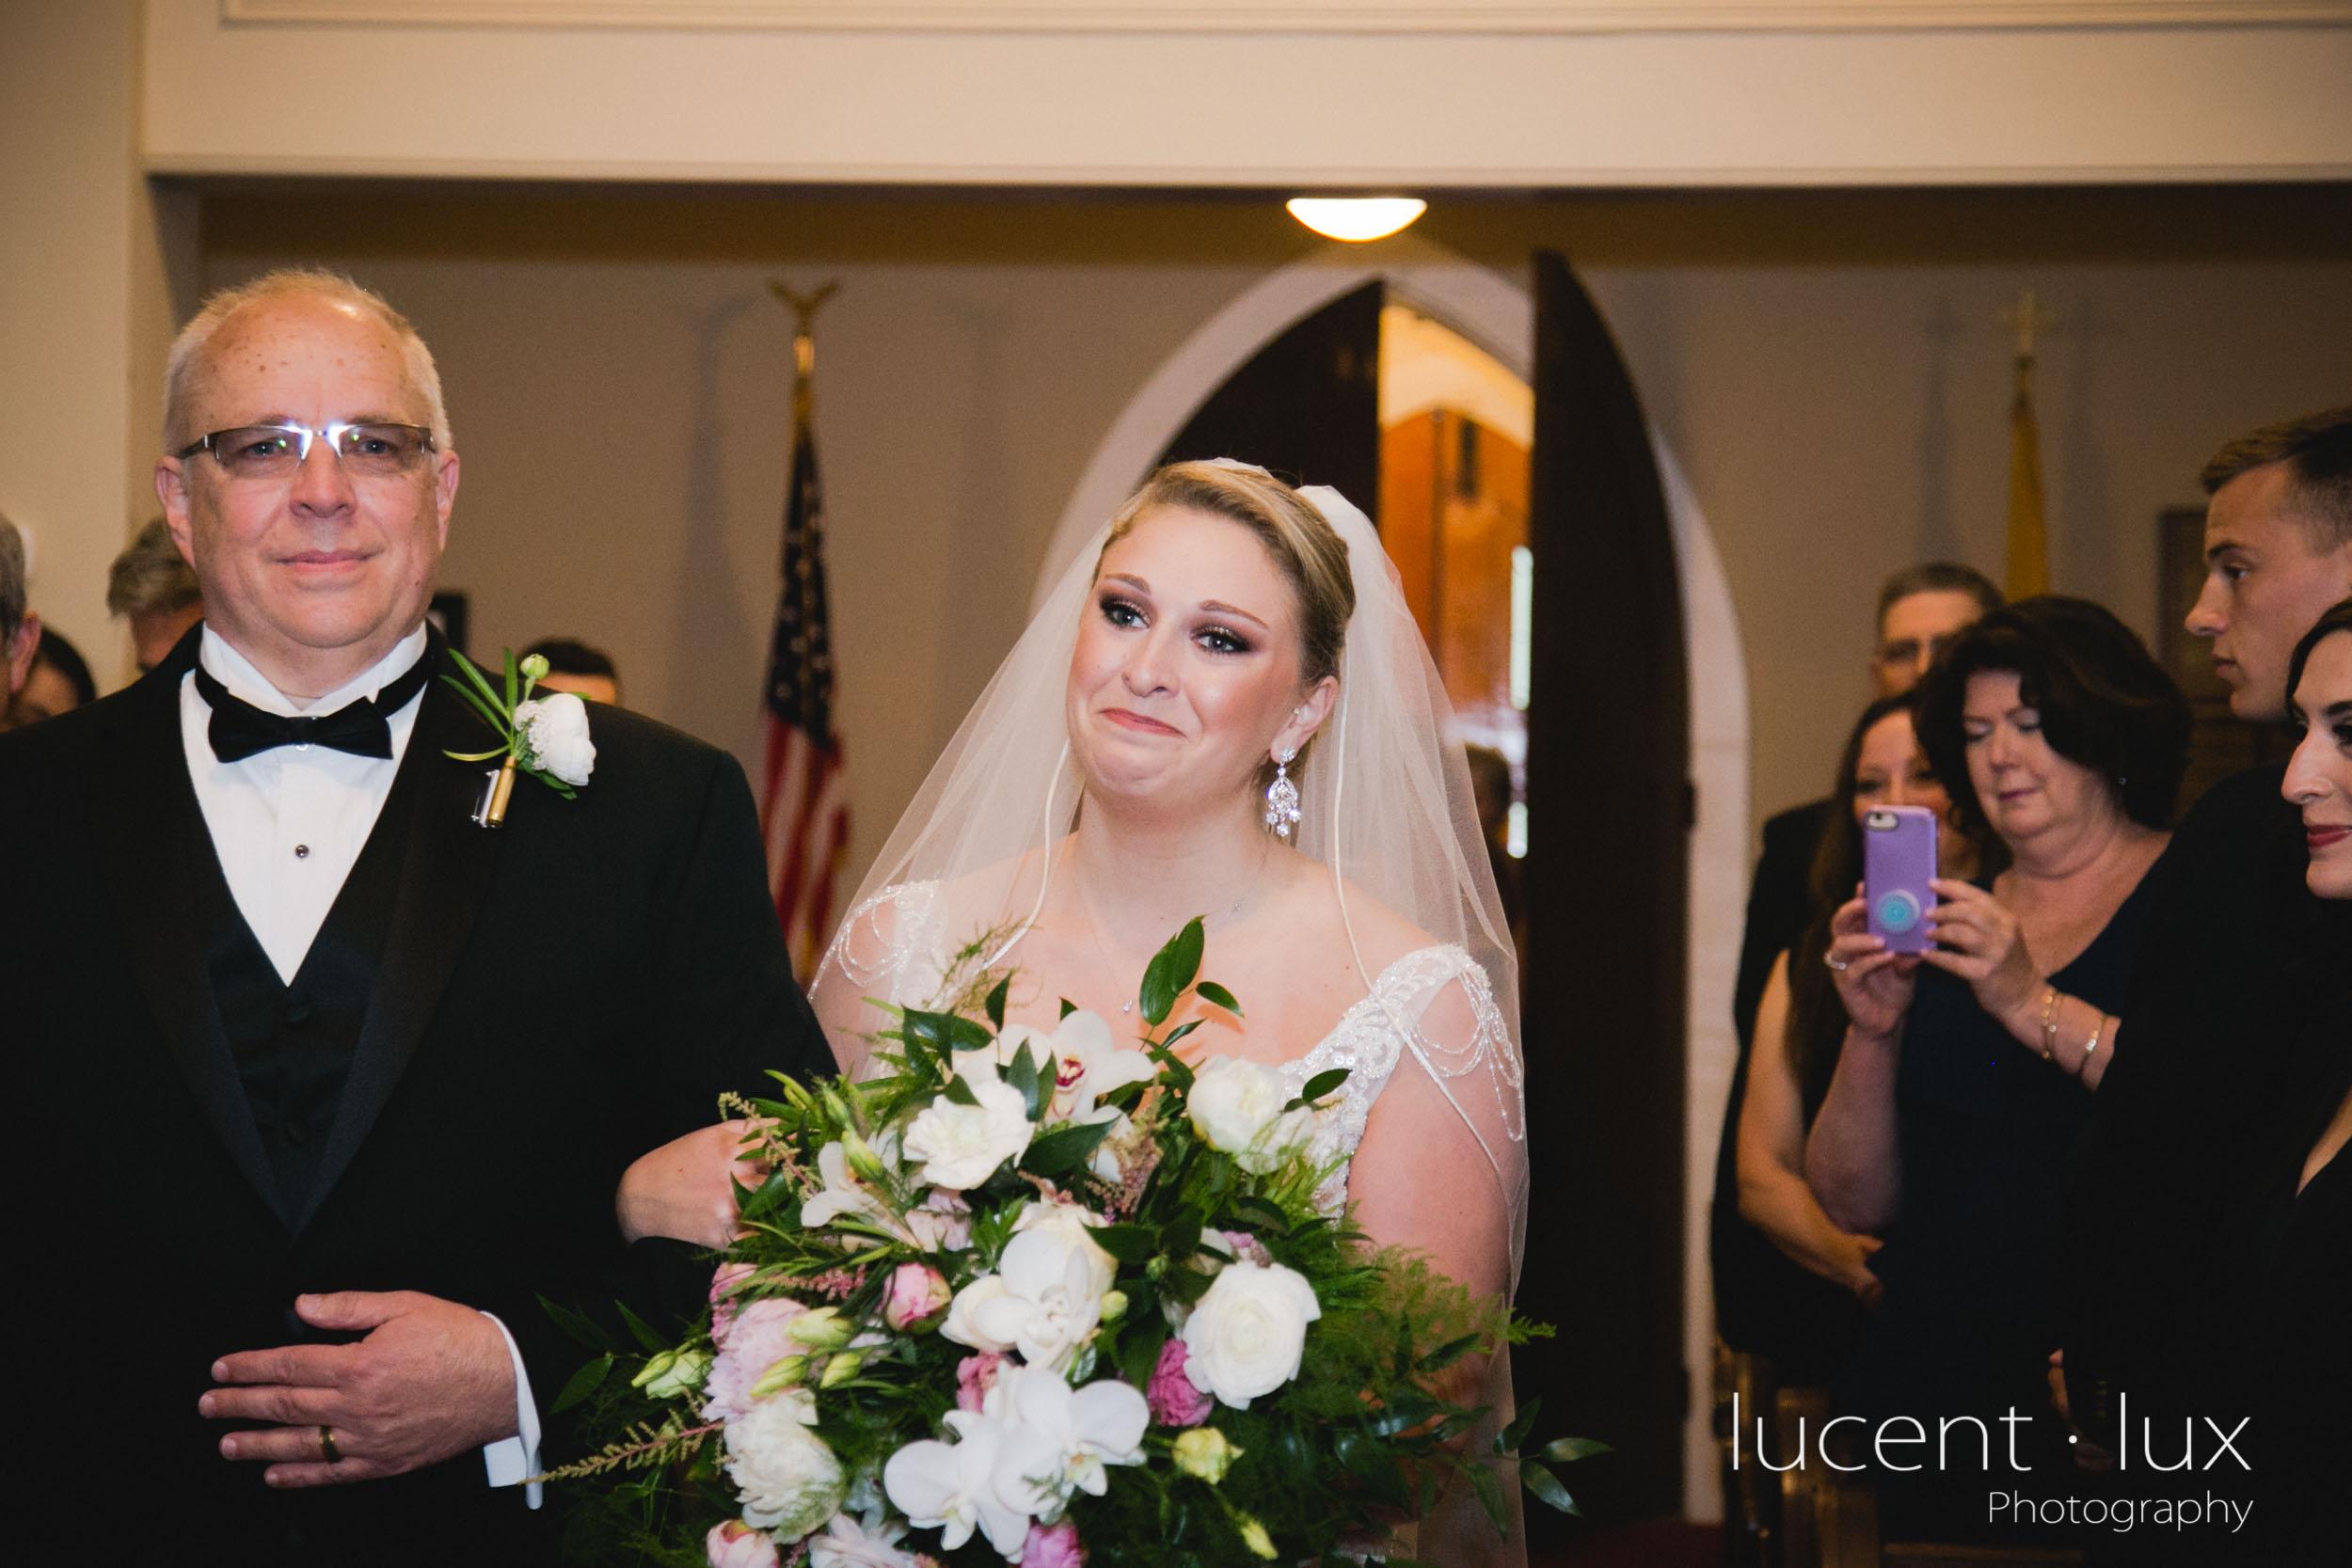 Wedding-Photography-Maryland-Pennsylvania-Photographer-Mendenhall-Inn-Media-Portrait-Event-117.jpg